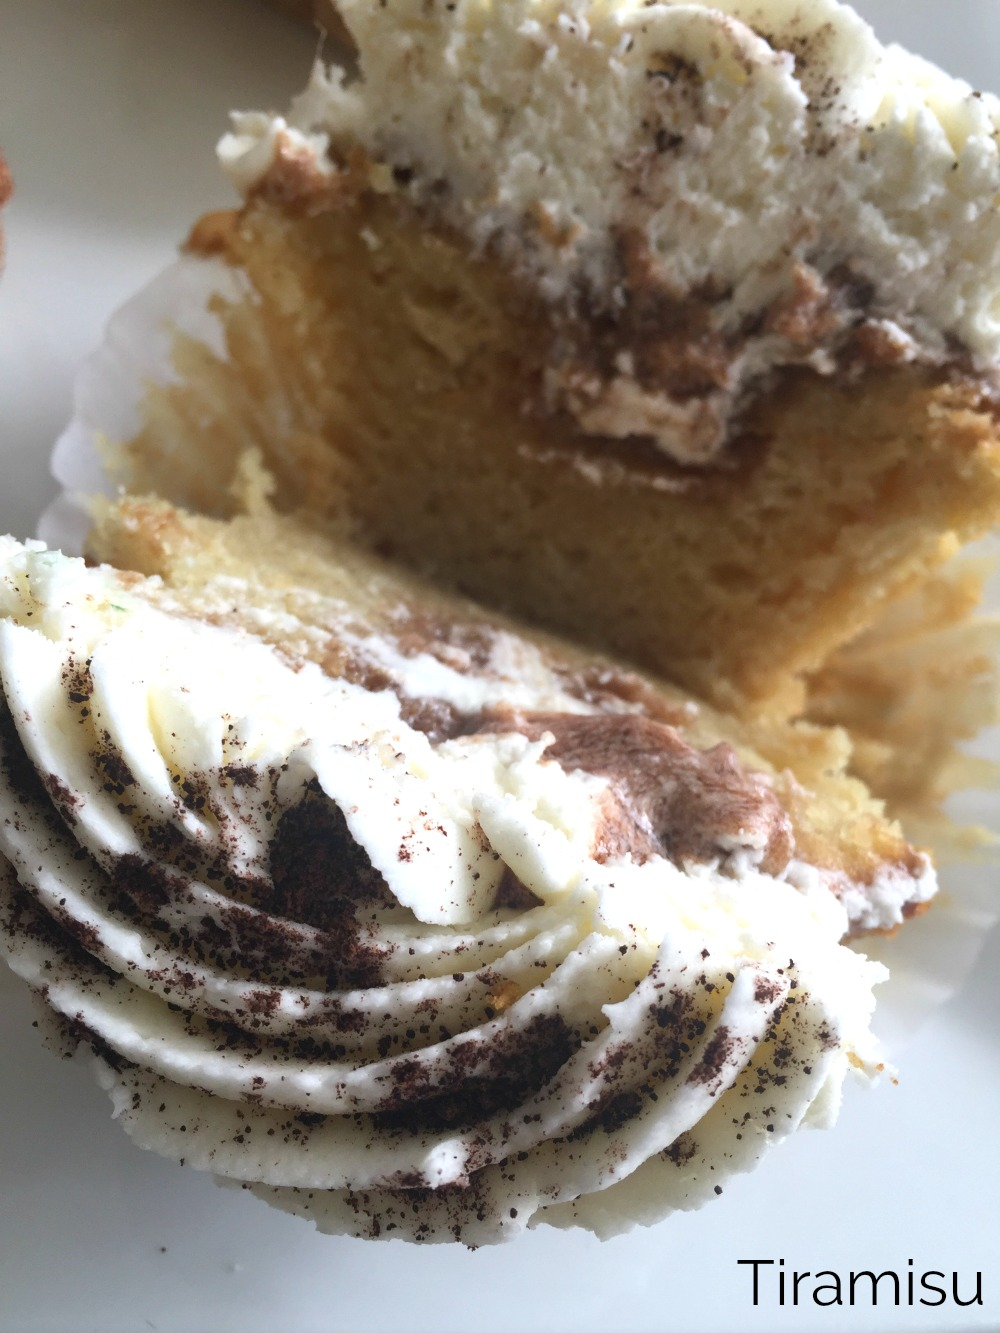 Blondie's Vegan Bakery & Cafe Tiramisu Cupcake-2.jpg